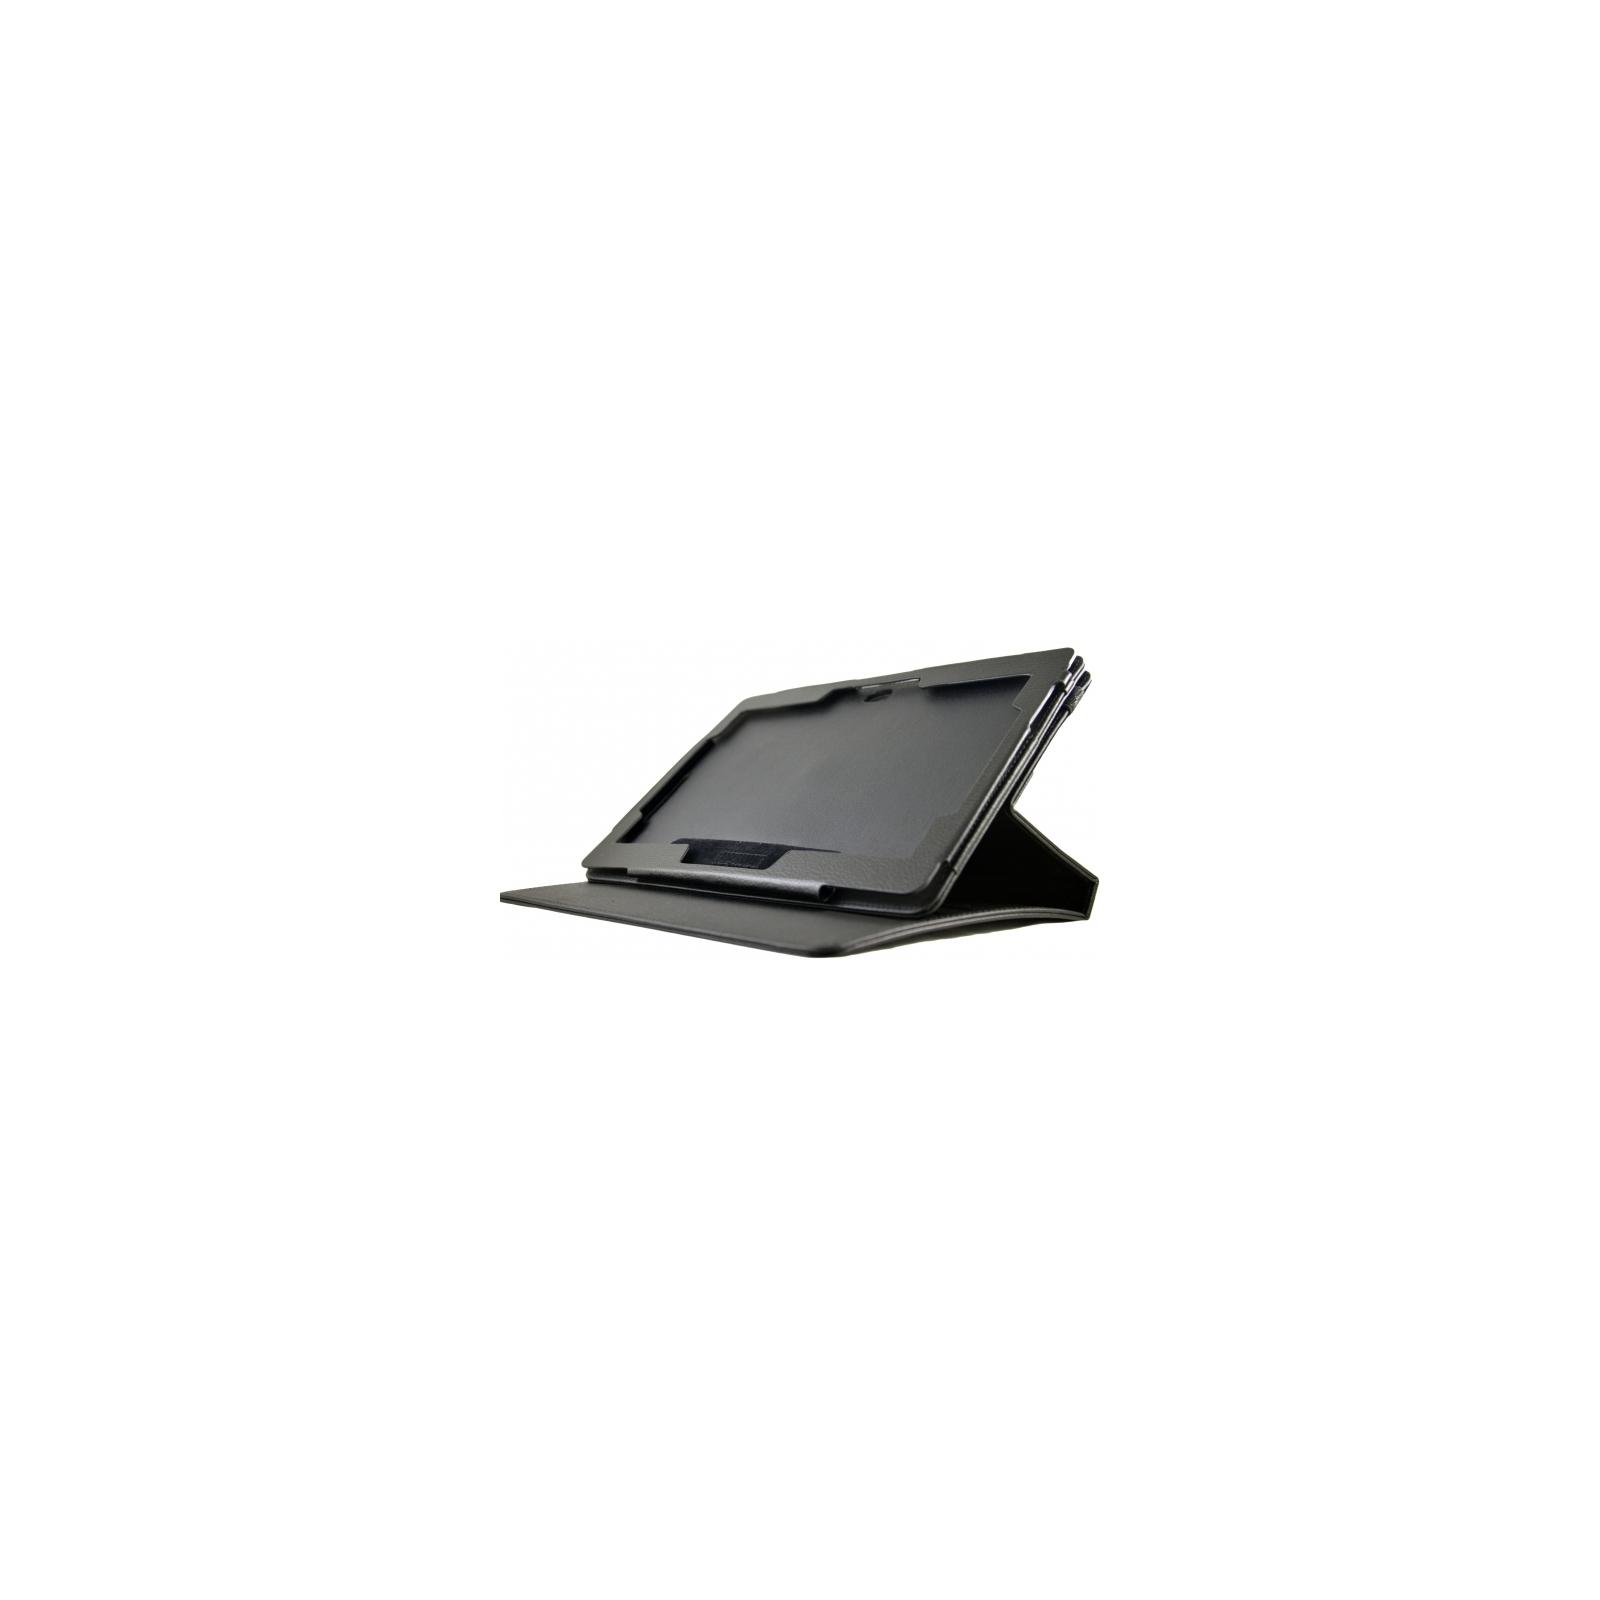 Чехол для планшета Pro-case ASUS VivoTab Smart ME400 rotate (ME400 rot) изображение 2